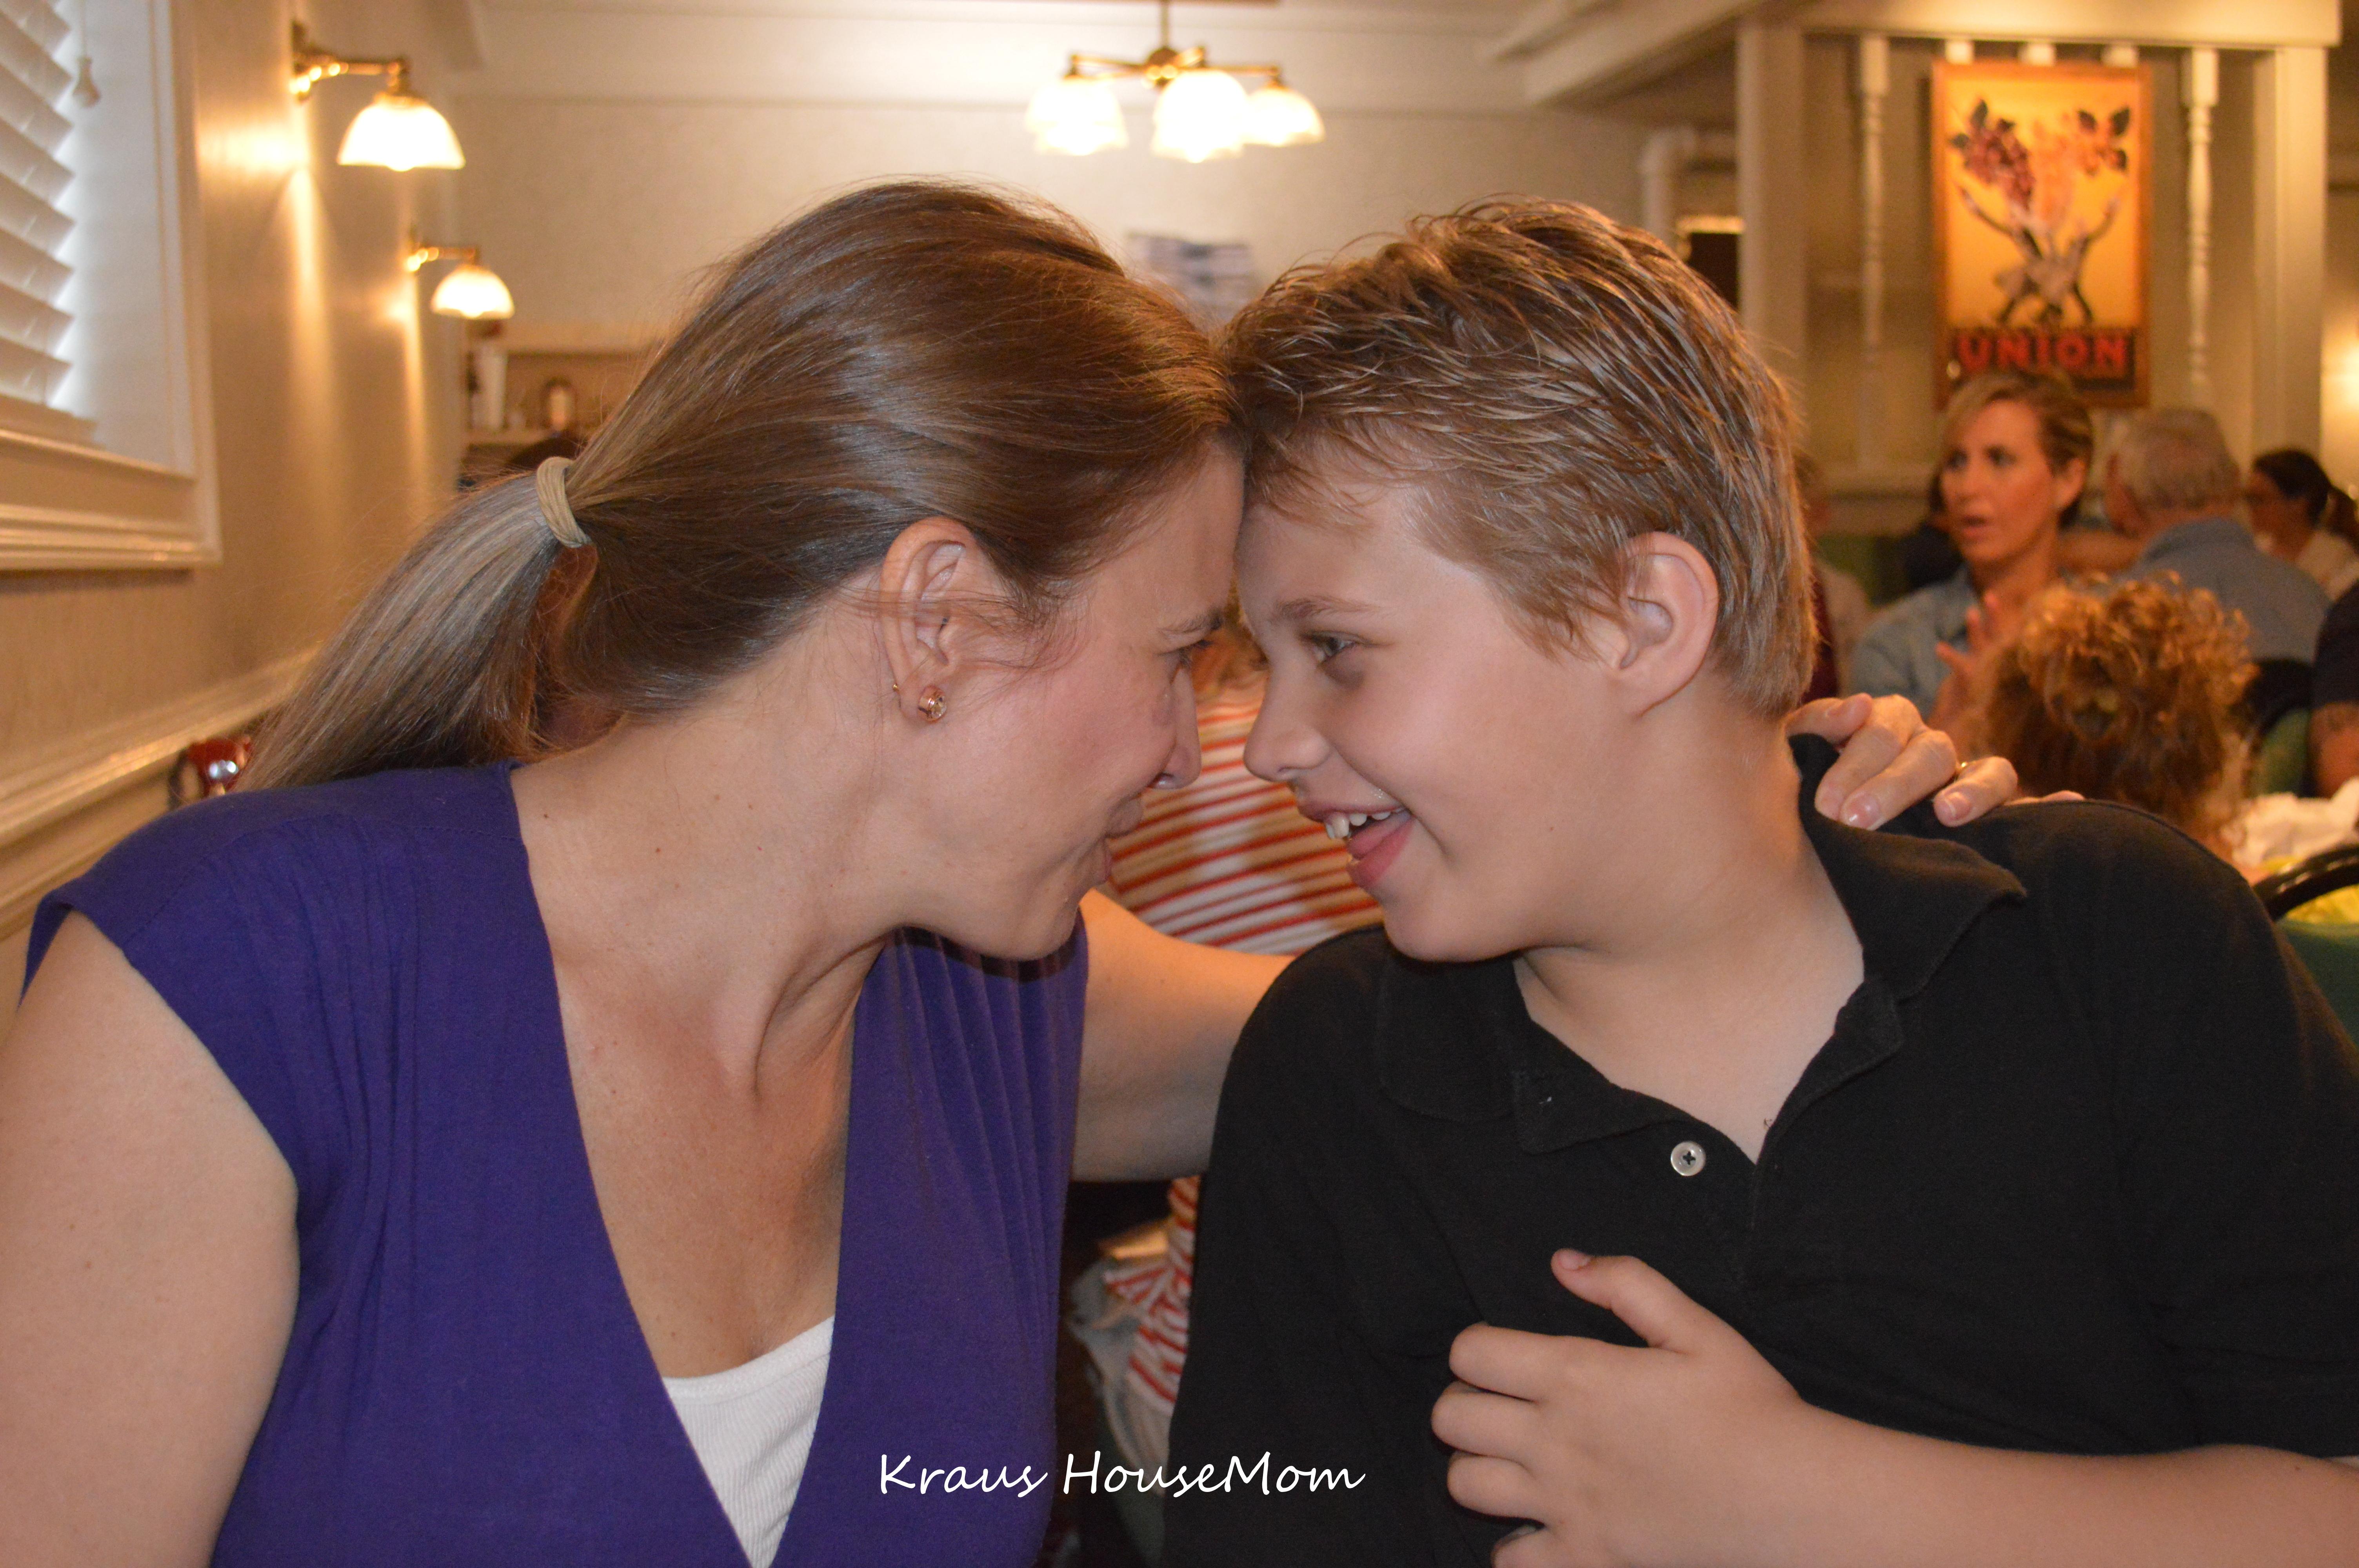 Kraus House Mom